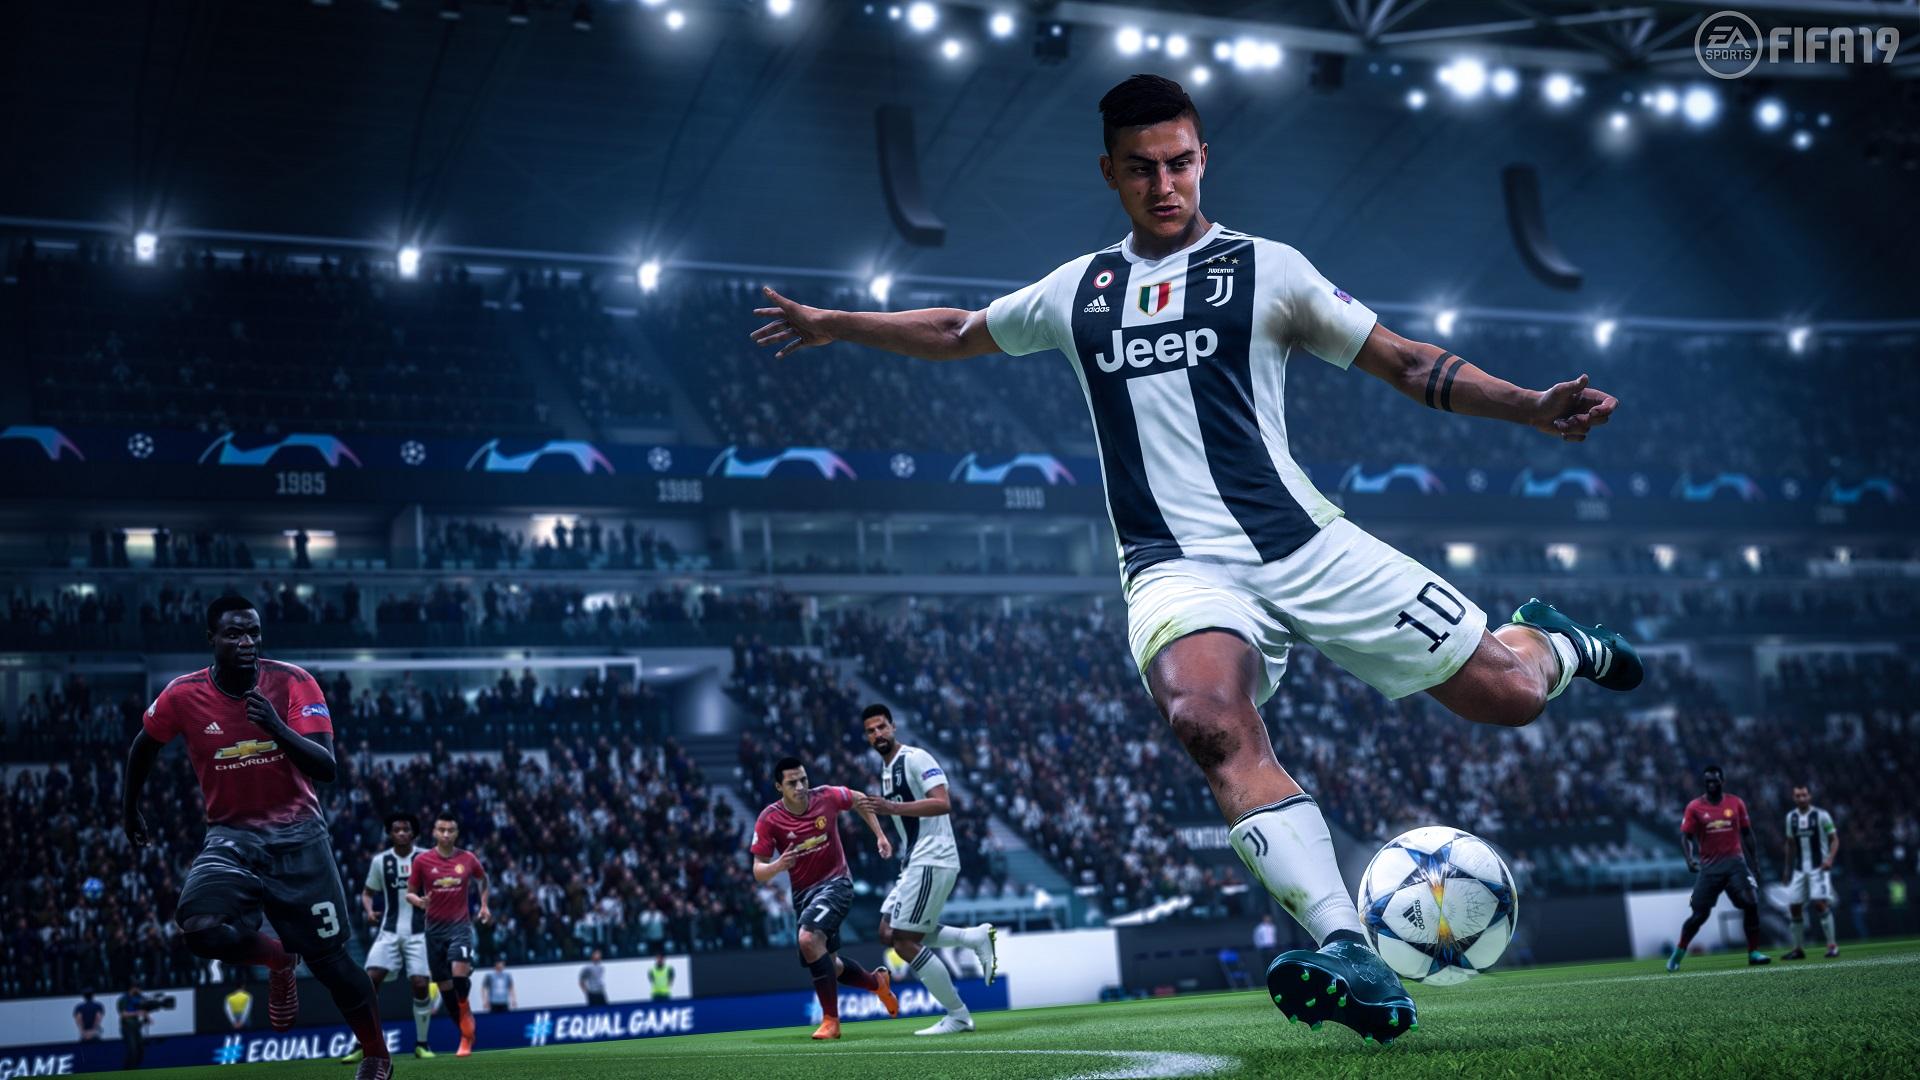 FIFA 19 Timed Finishing